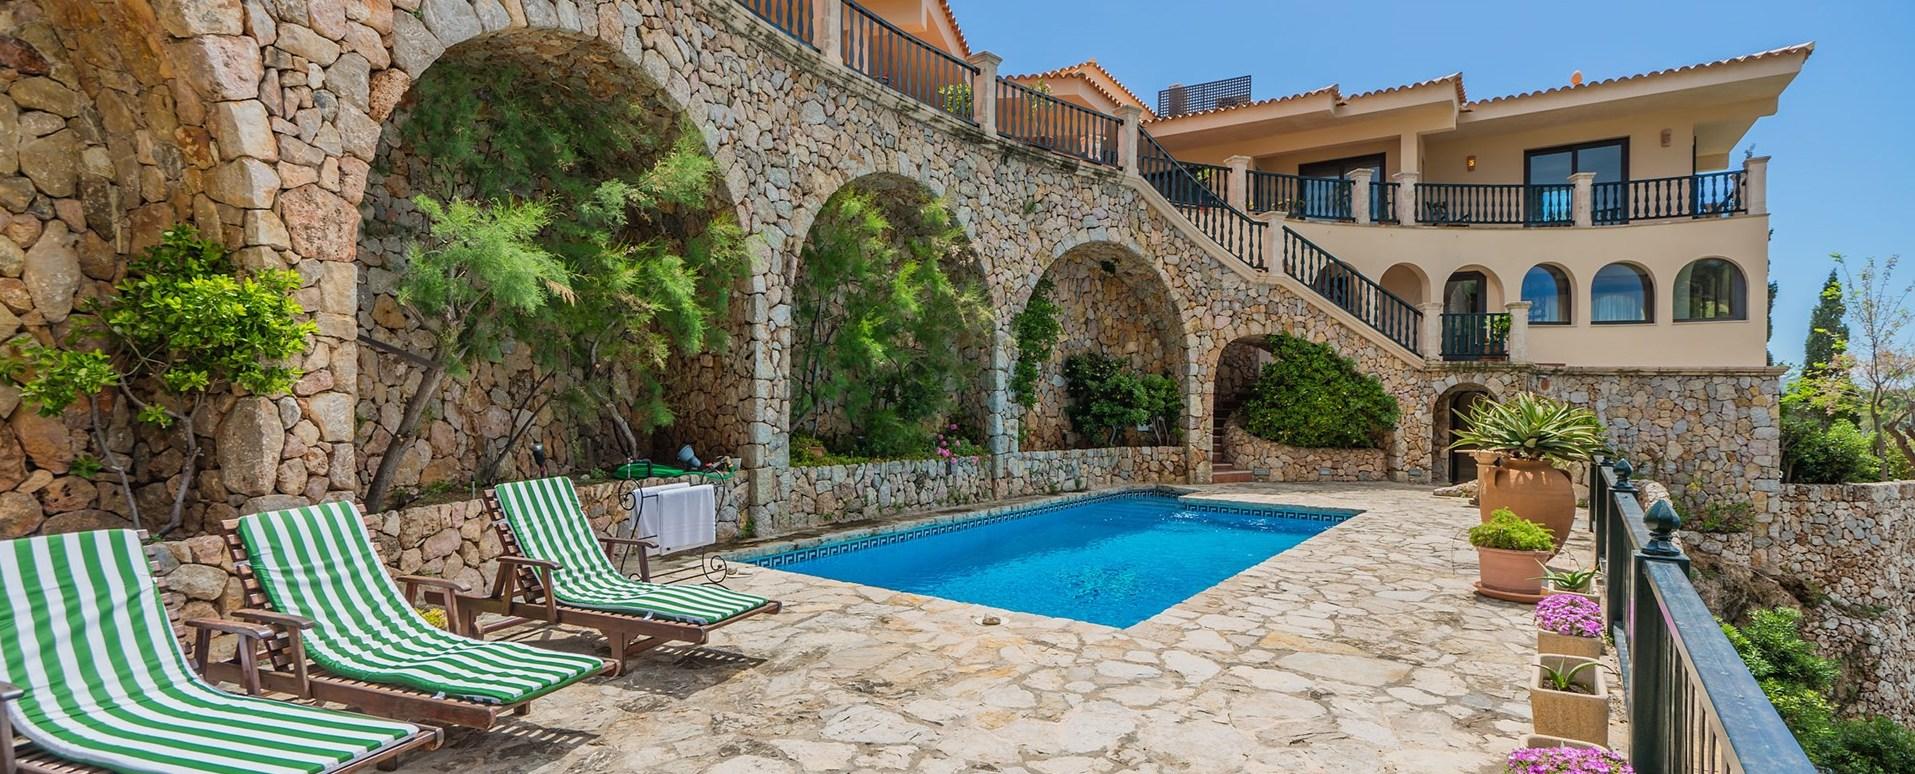 villa-el-mirador-pool-terrace